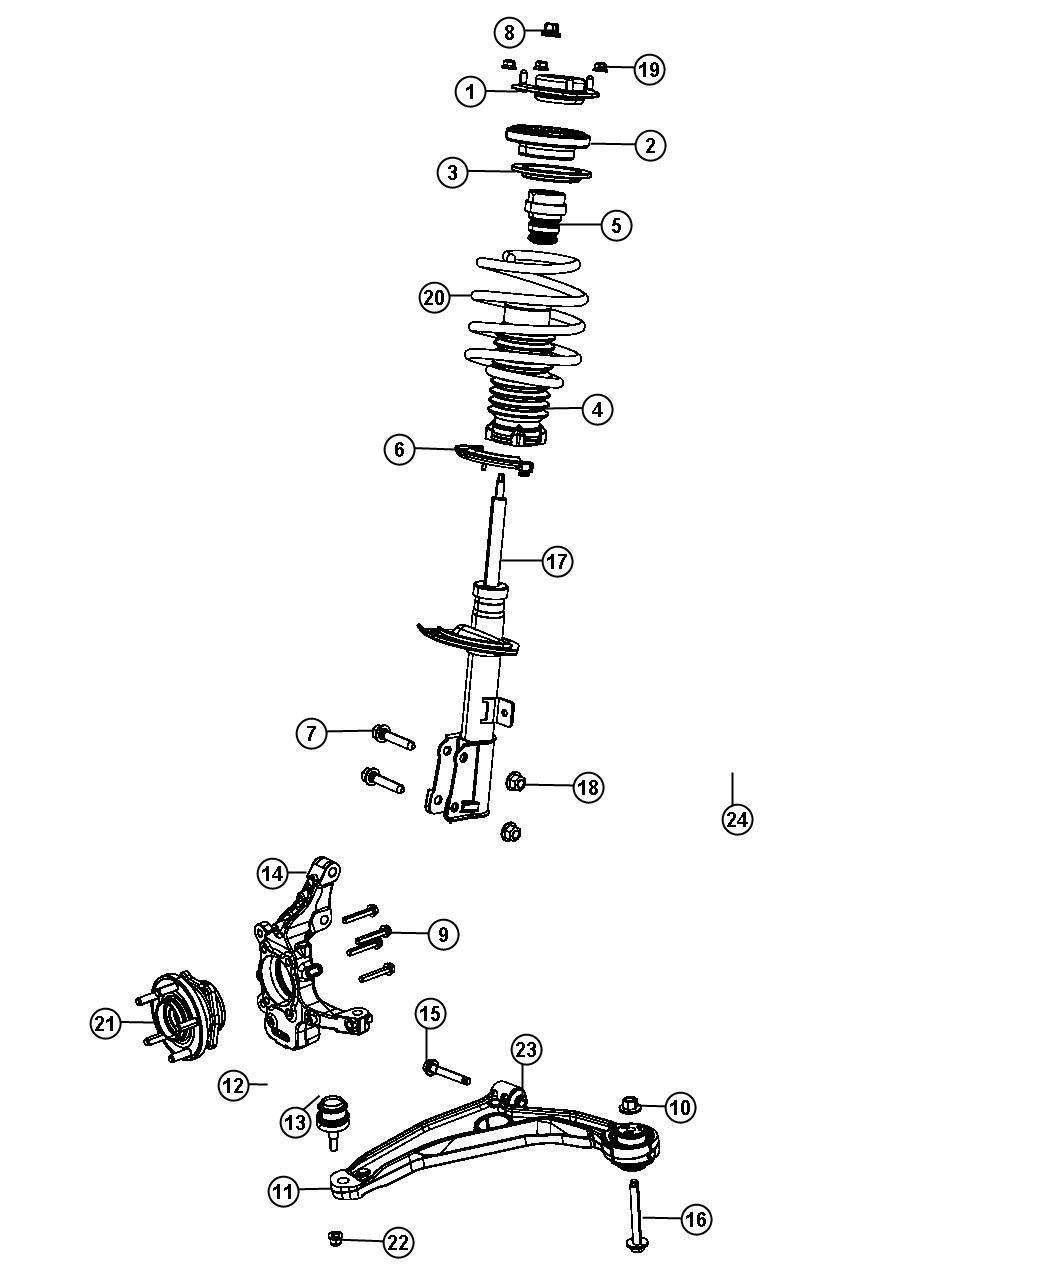 Service manual [2012 Dodge Journey Front Spring Removal